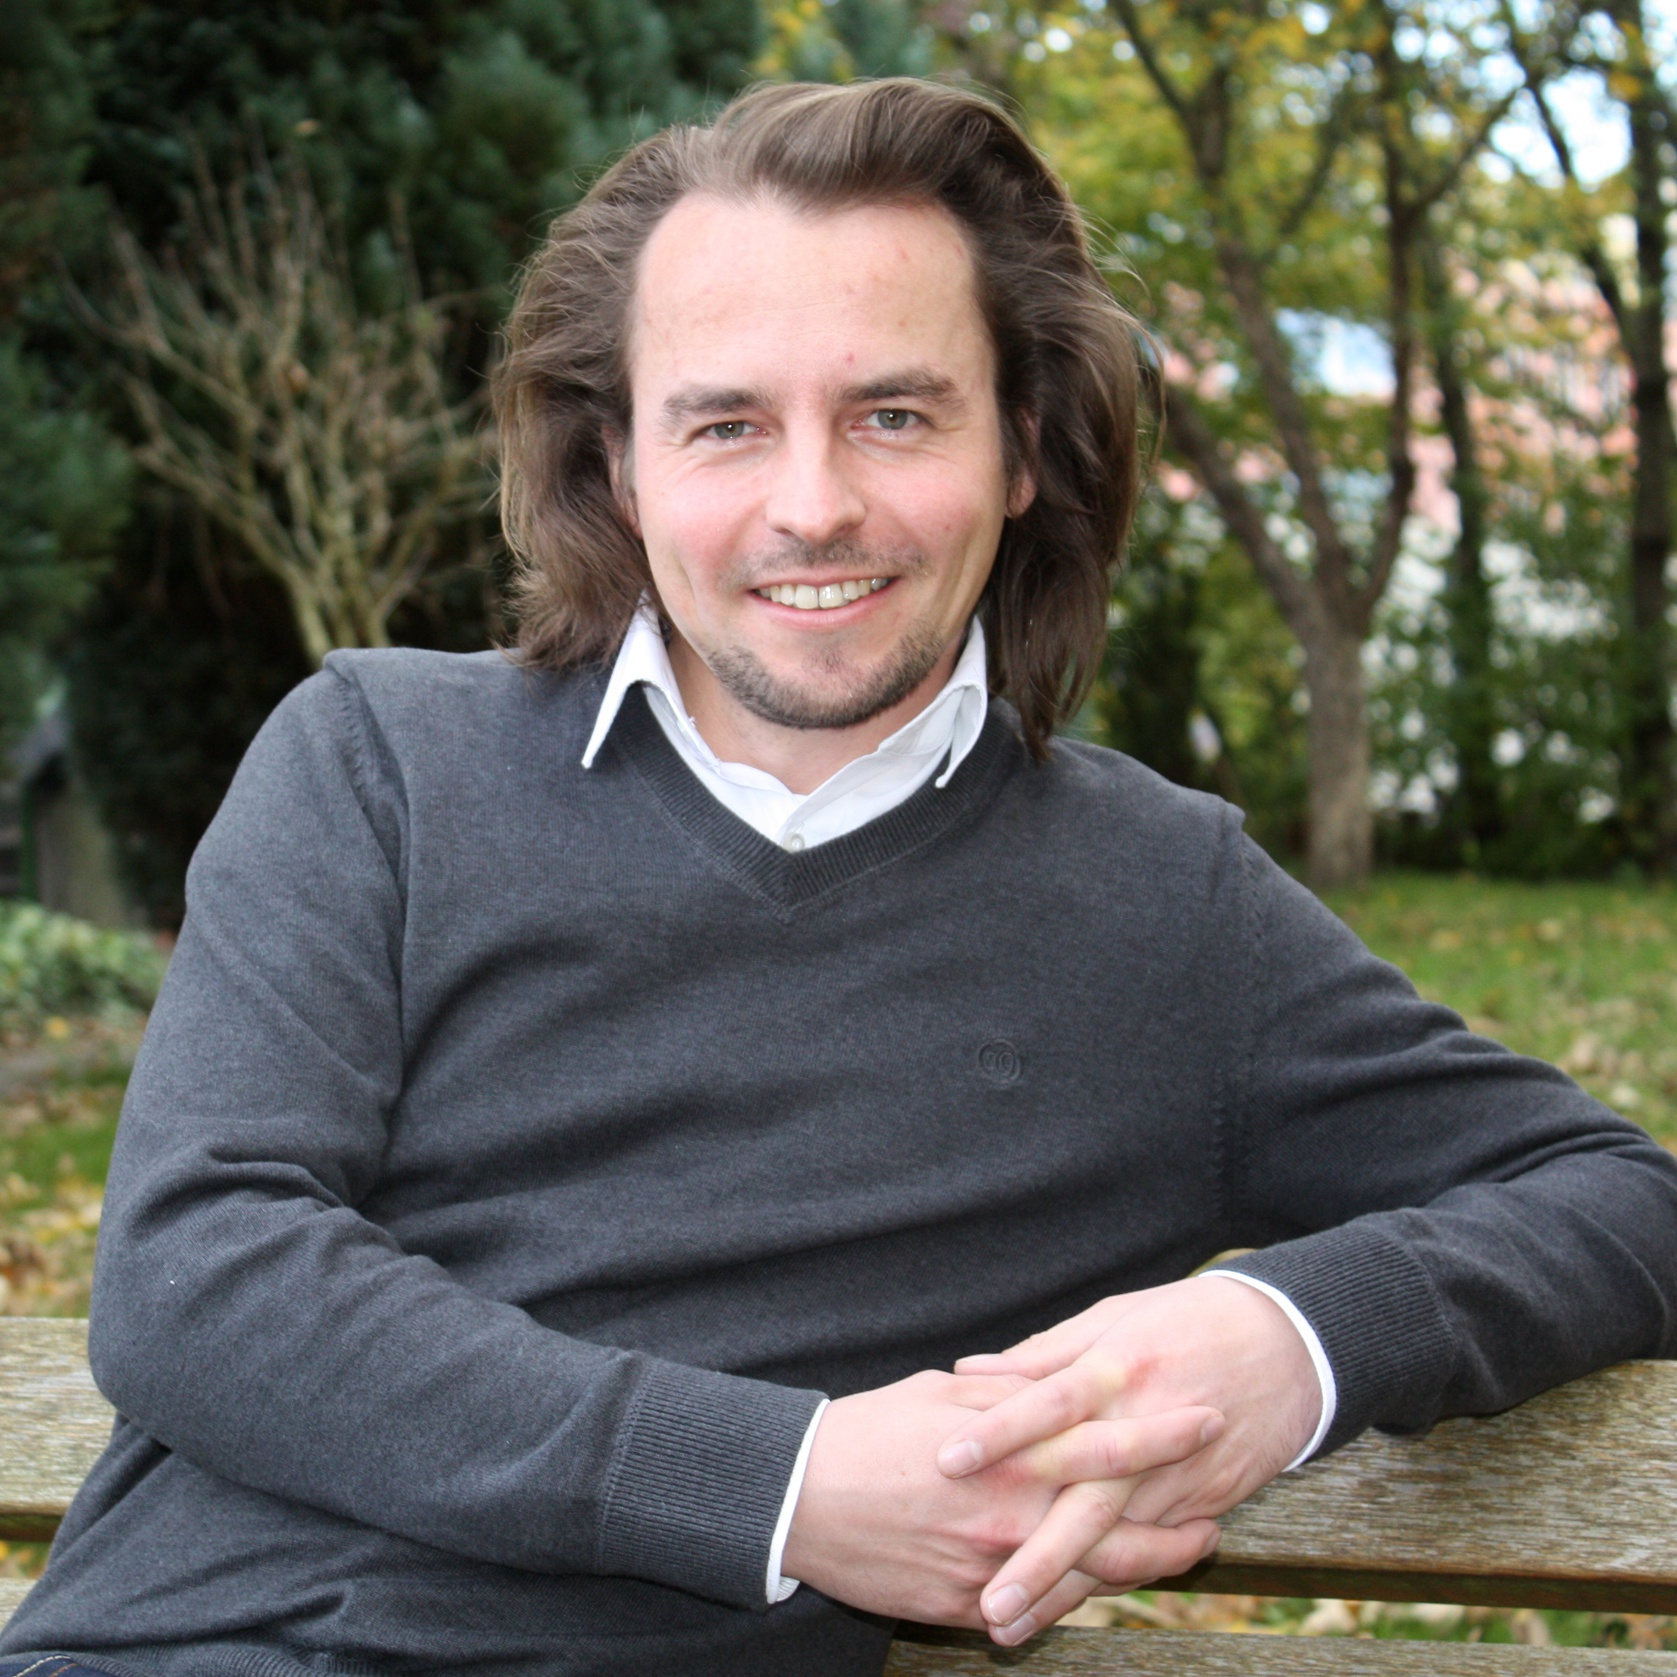 Pfarrer Björn Corzilius, Höxter